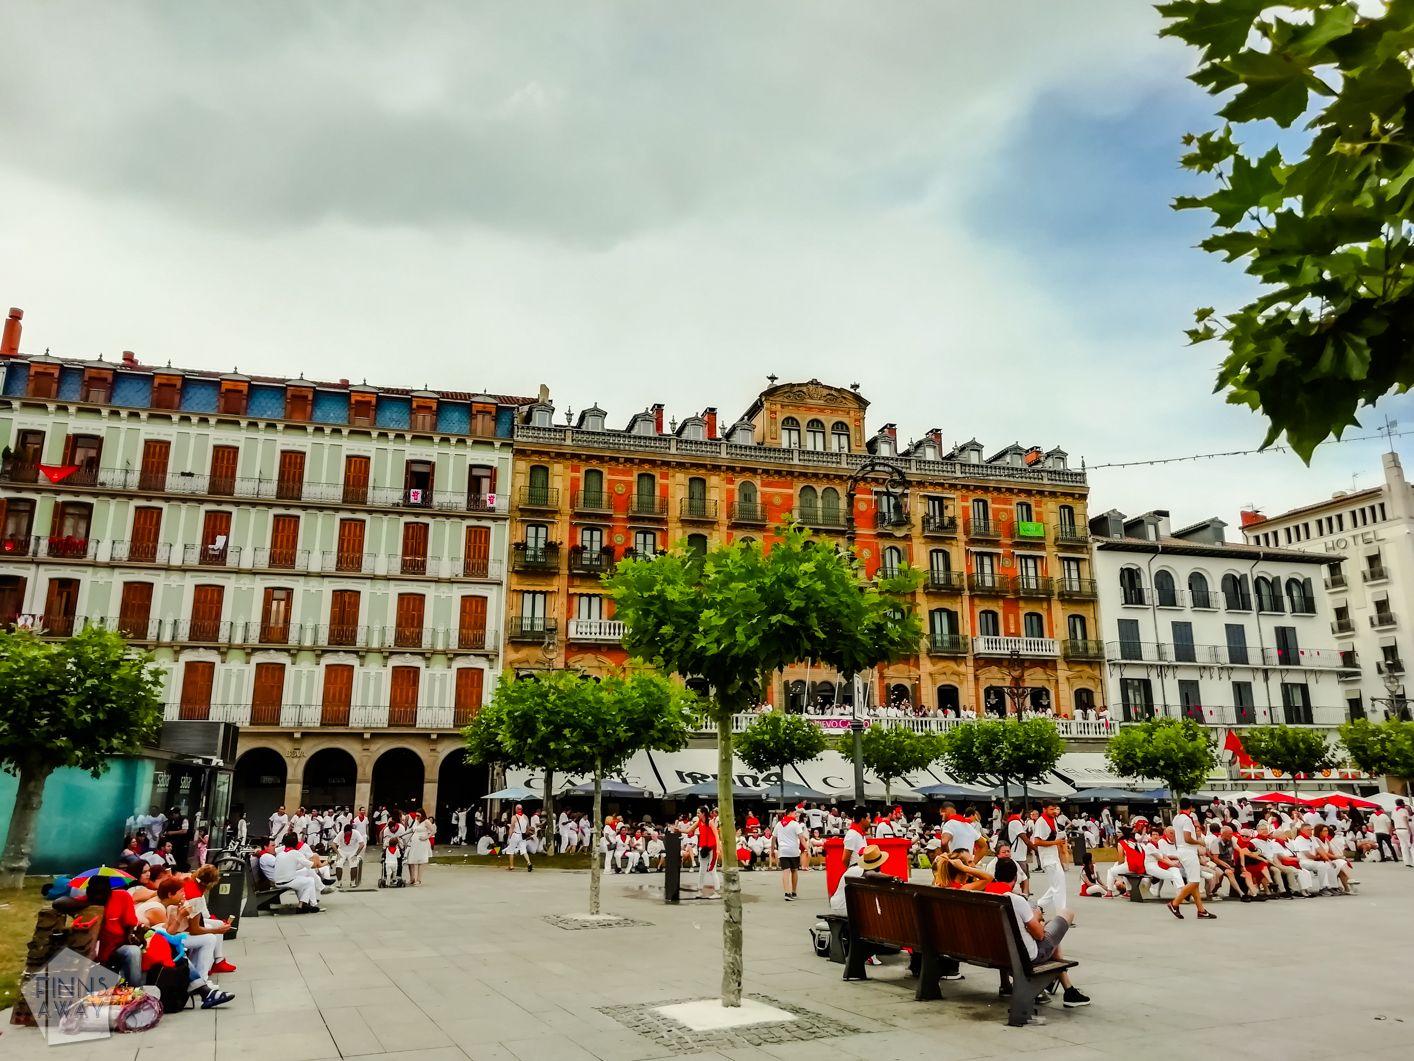 Pamplona | San Fermin | Basque Country | FinnsAway Travel Blog